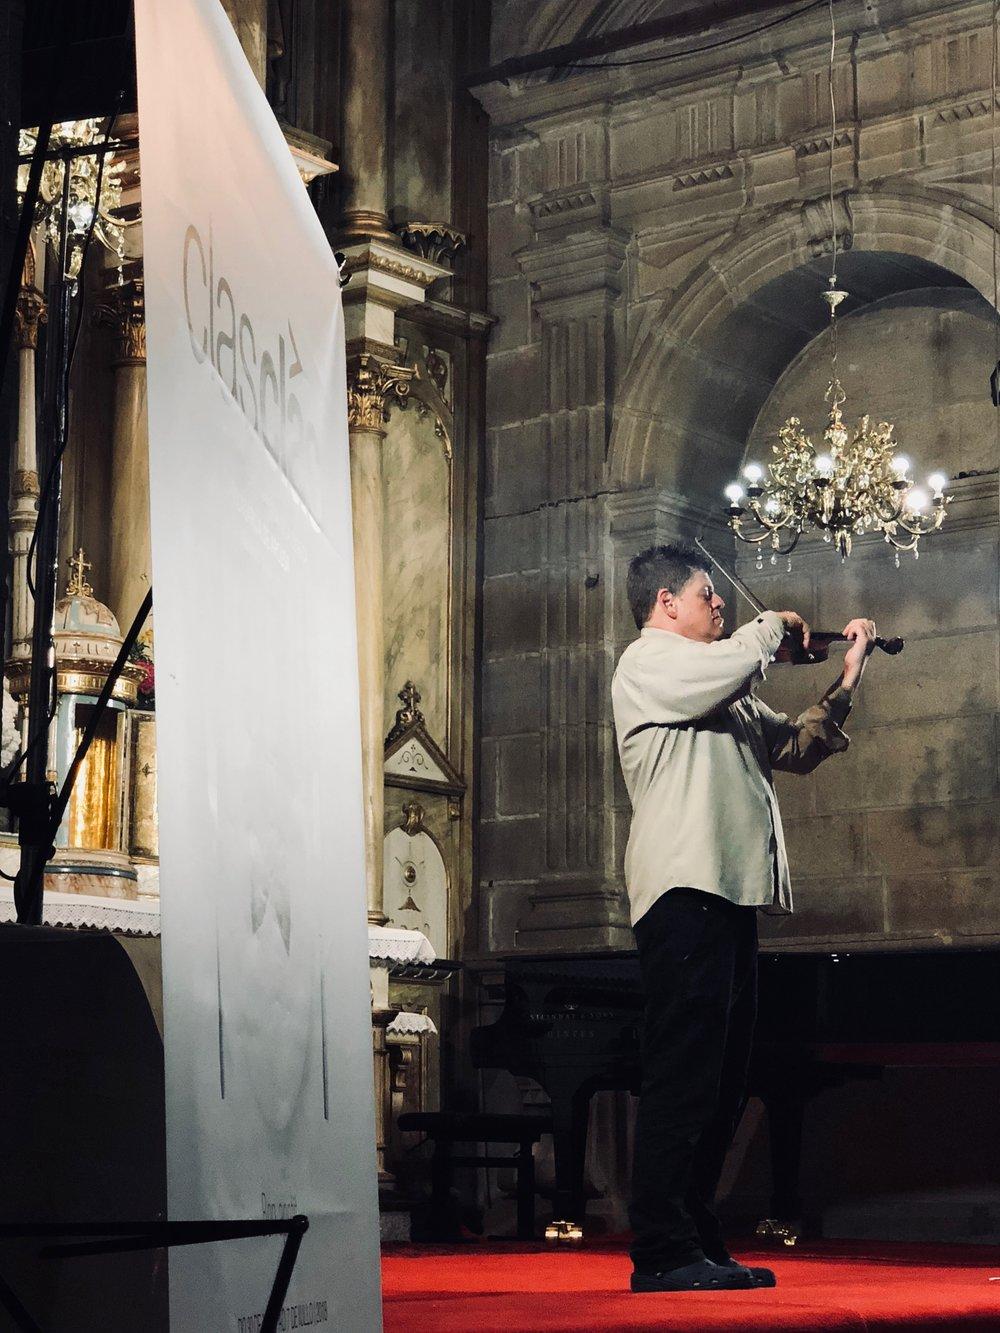 Day 5 - Convento de Vista